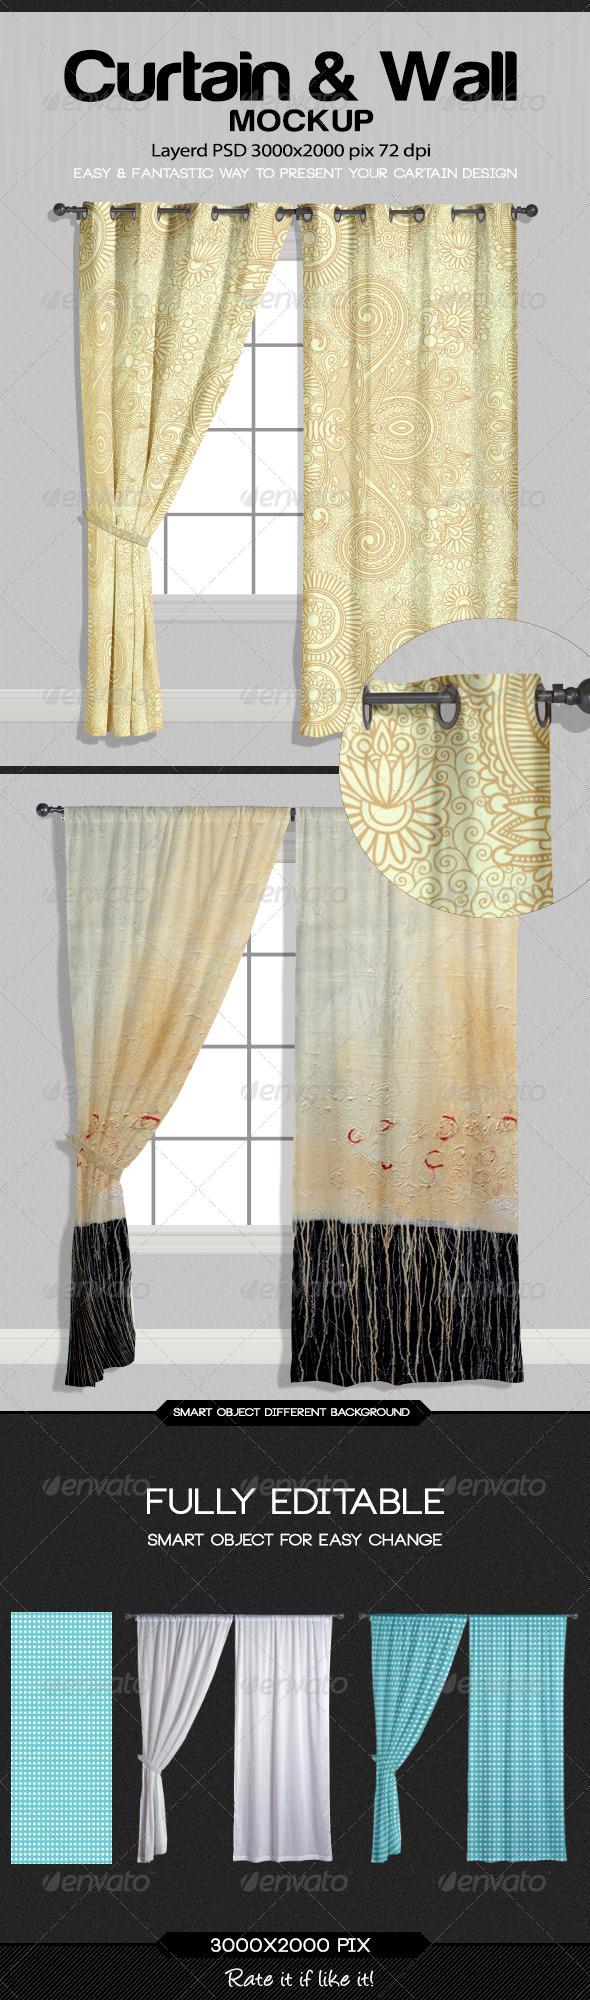 Curtain Wall Mockup Miscellaneous Print